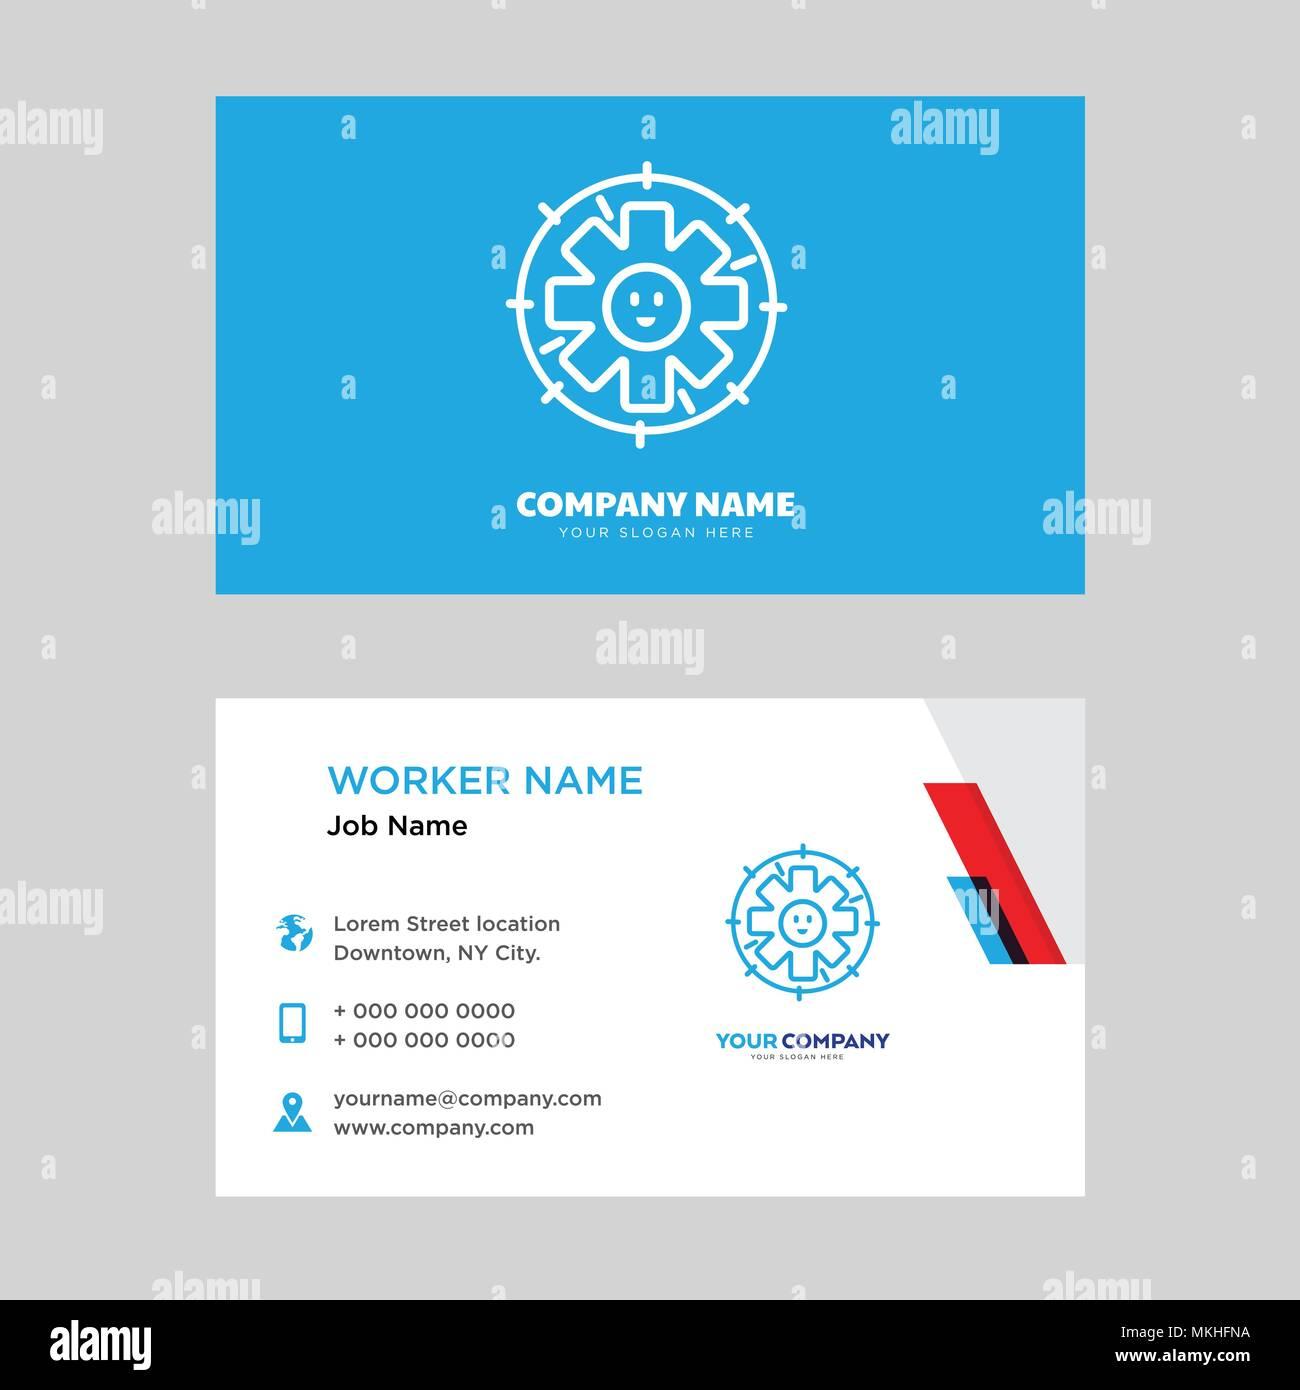 Technical support business card design template visiting for your technical support business card design template visiting for your company modern horizontal identity card vector colourmoves